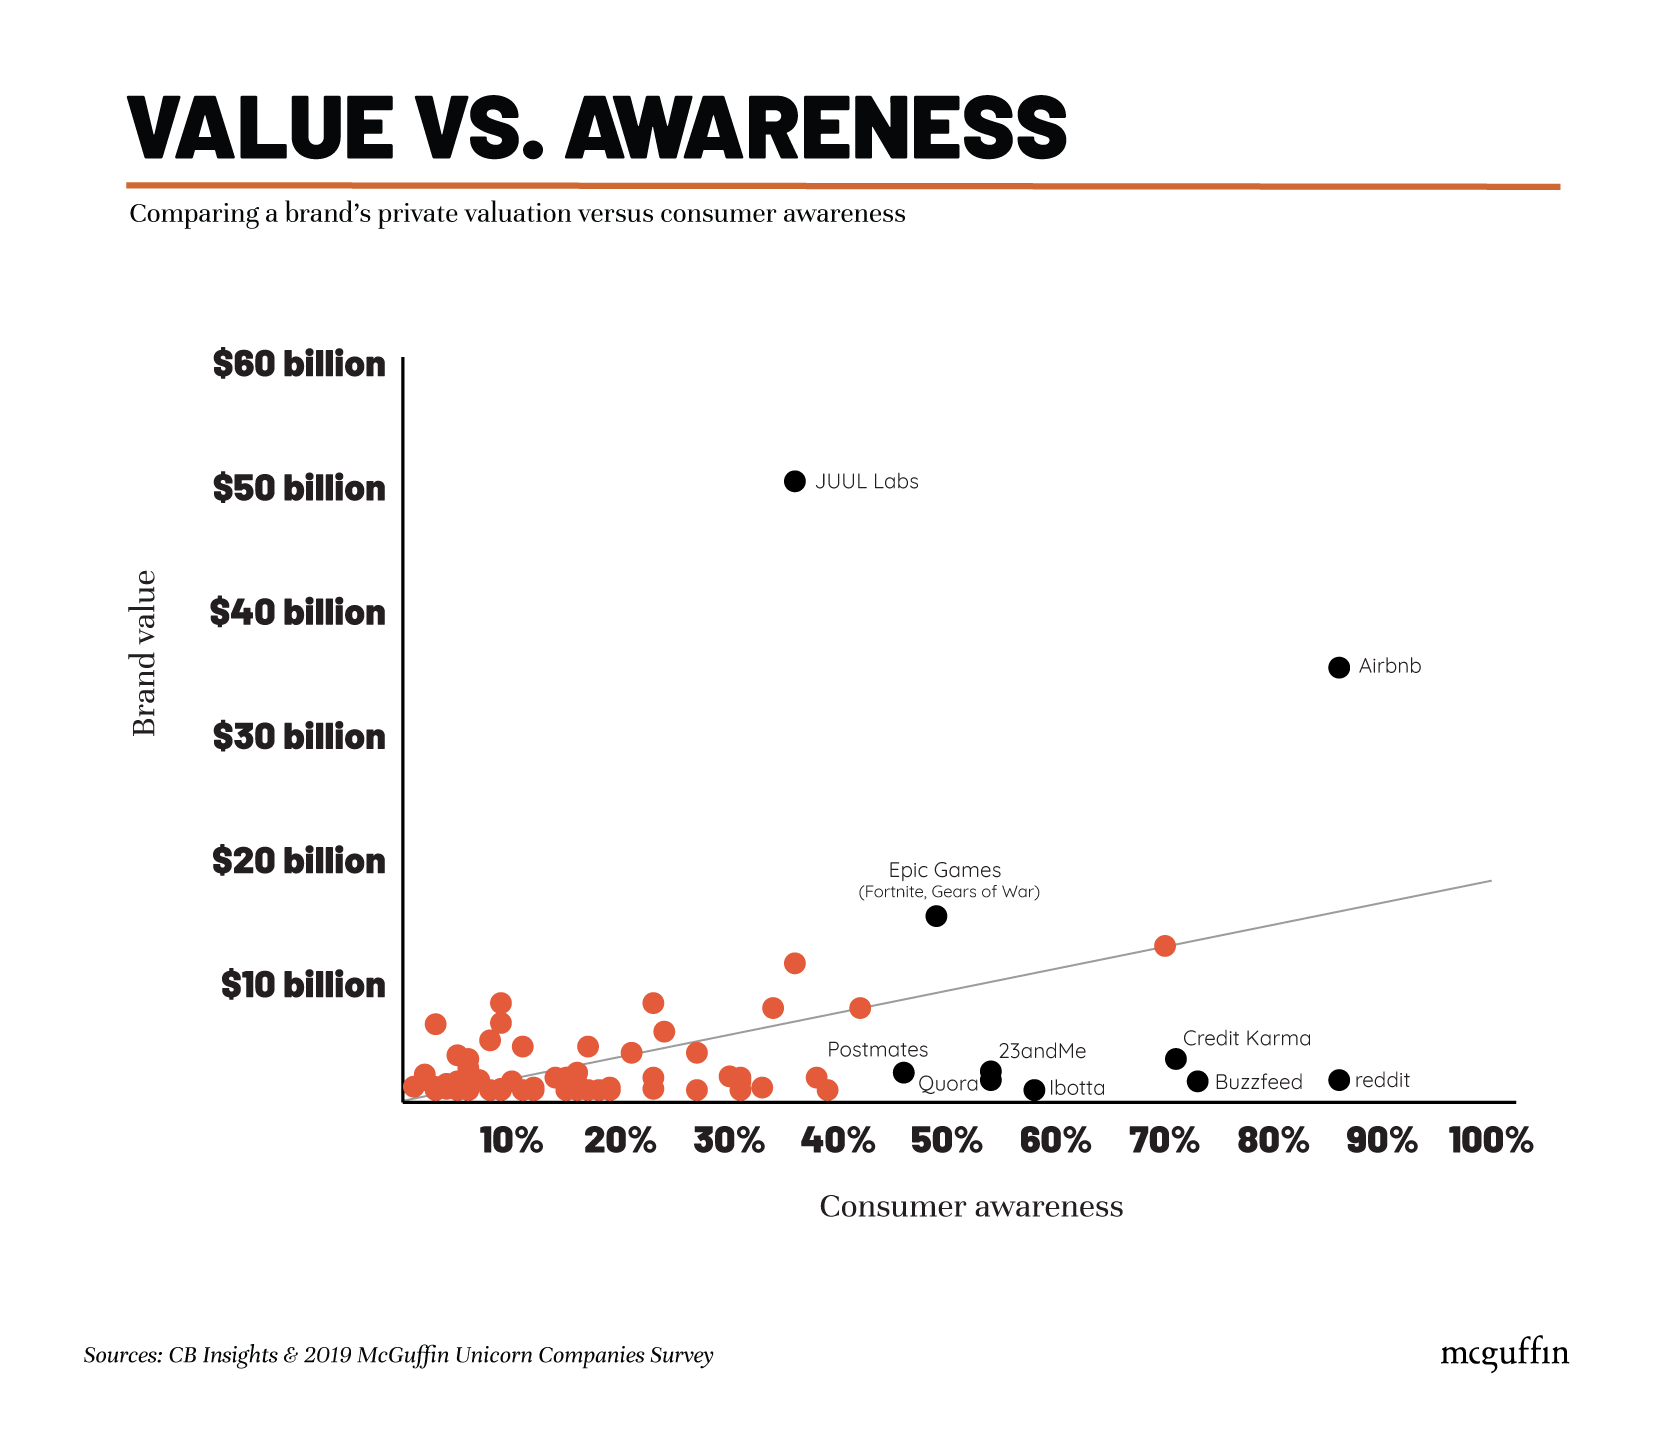 <Unicorn companies - value vs awareness>